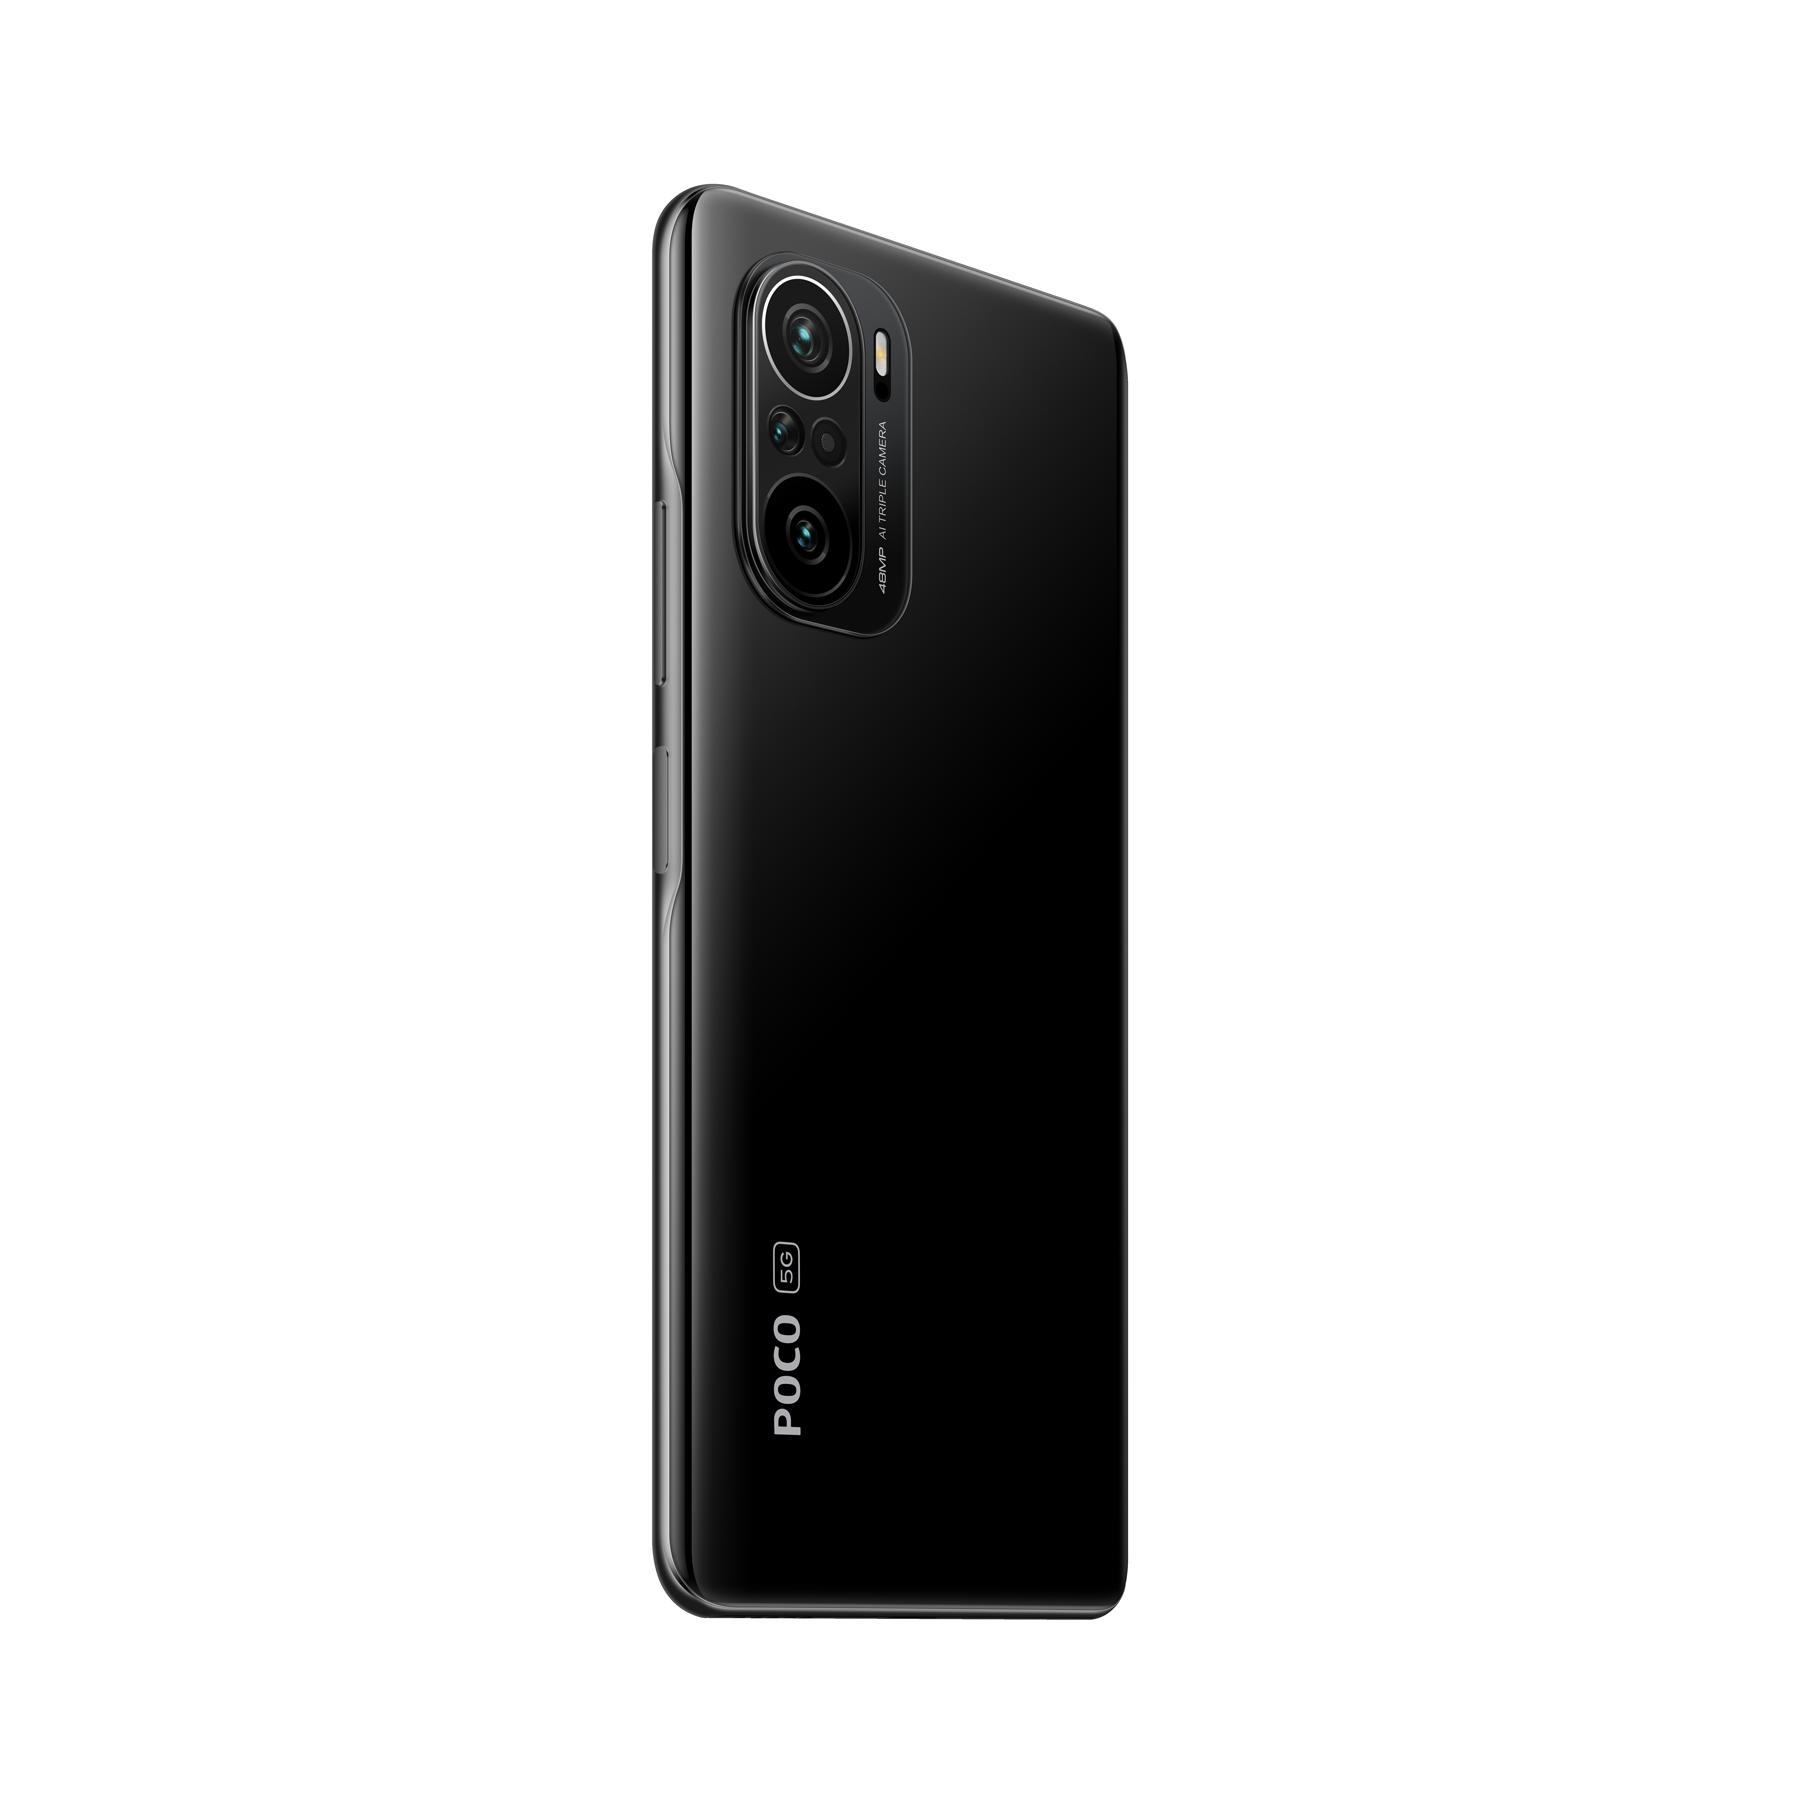 POCO F3 black %E4%B8%B0%E7%A2%91 %E8%83%8C POCO pomera granice sa novim POCO F3 i POCO X3 Pro mobilnim telefonima